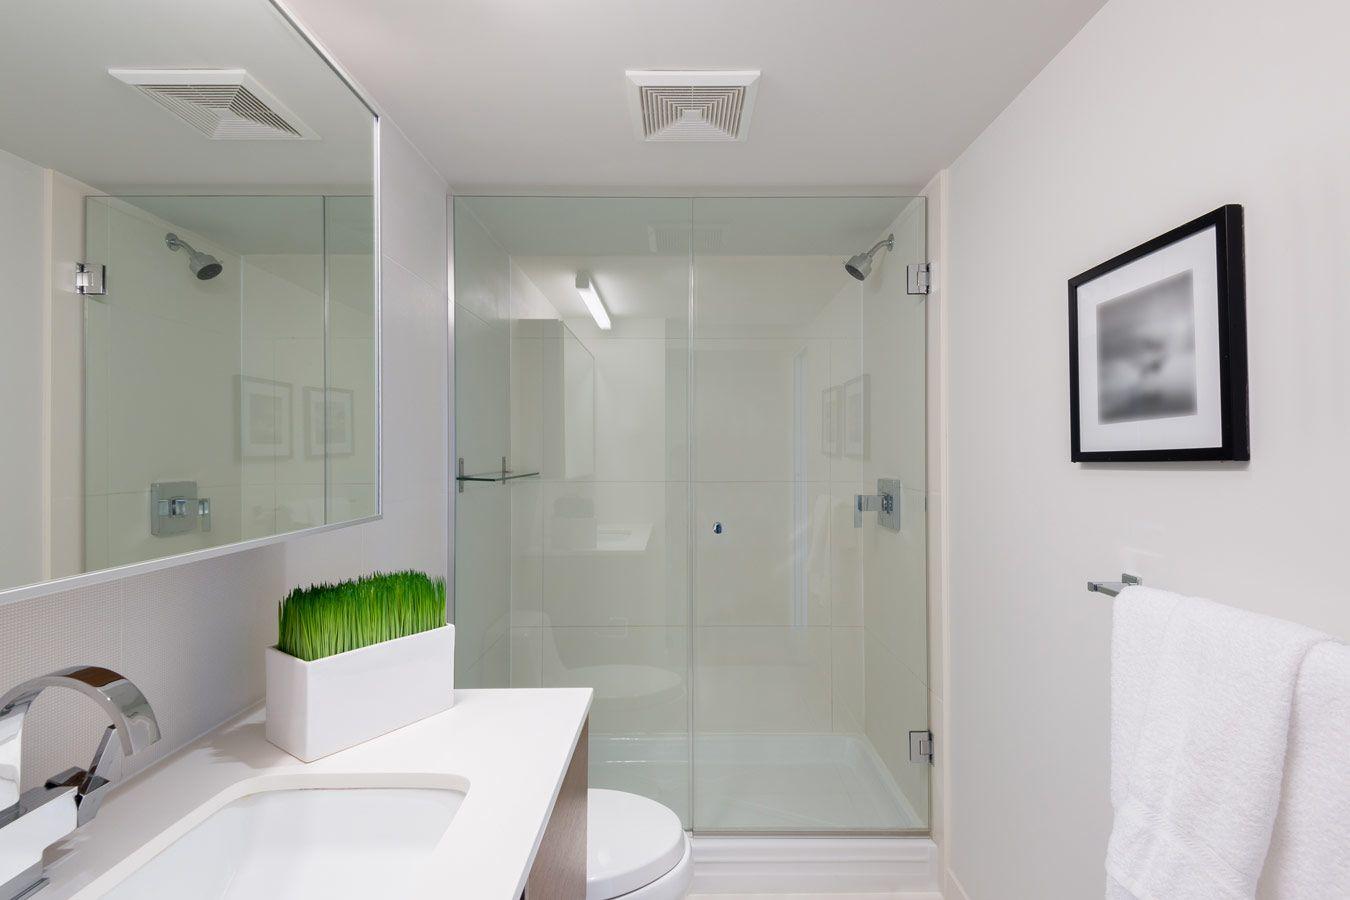 gesloten douche met glazen douchewanden kleine badkamer